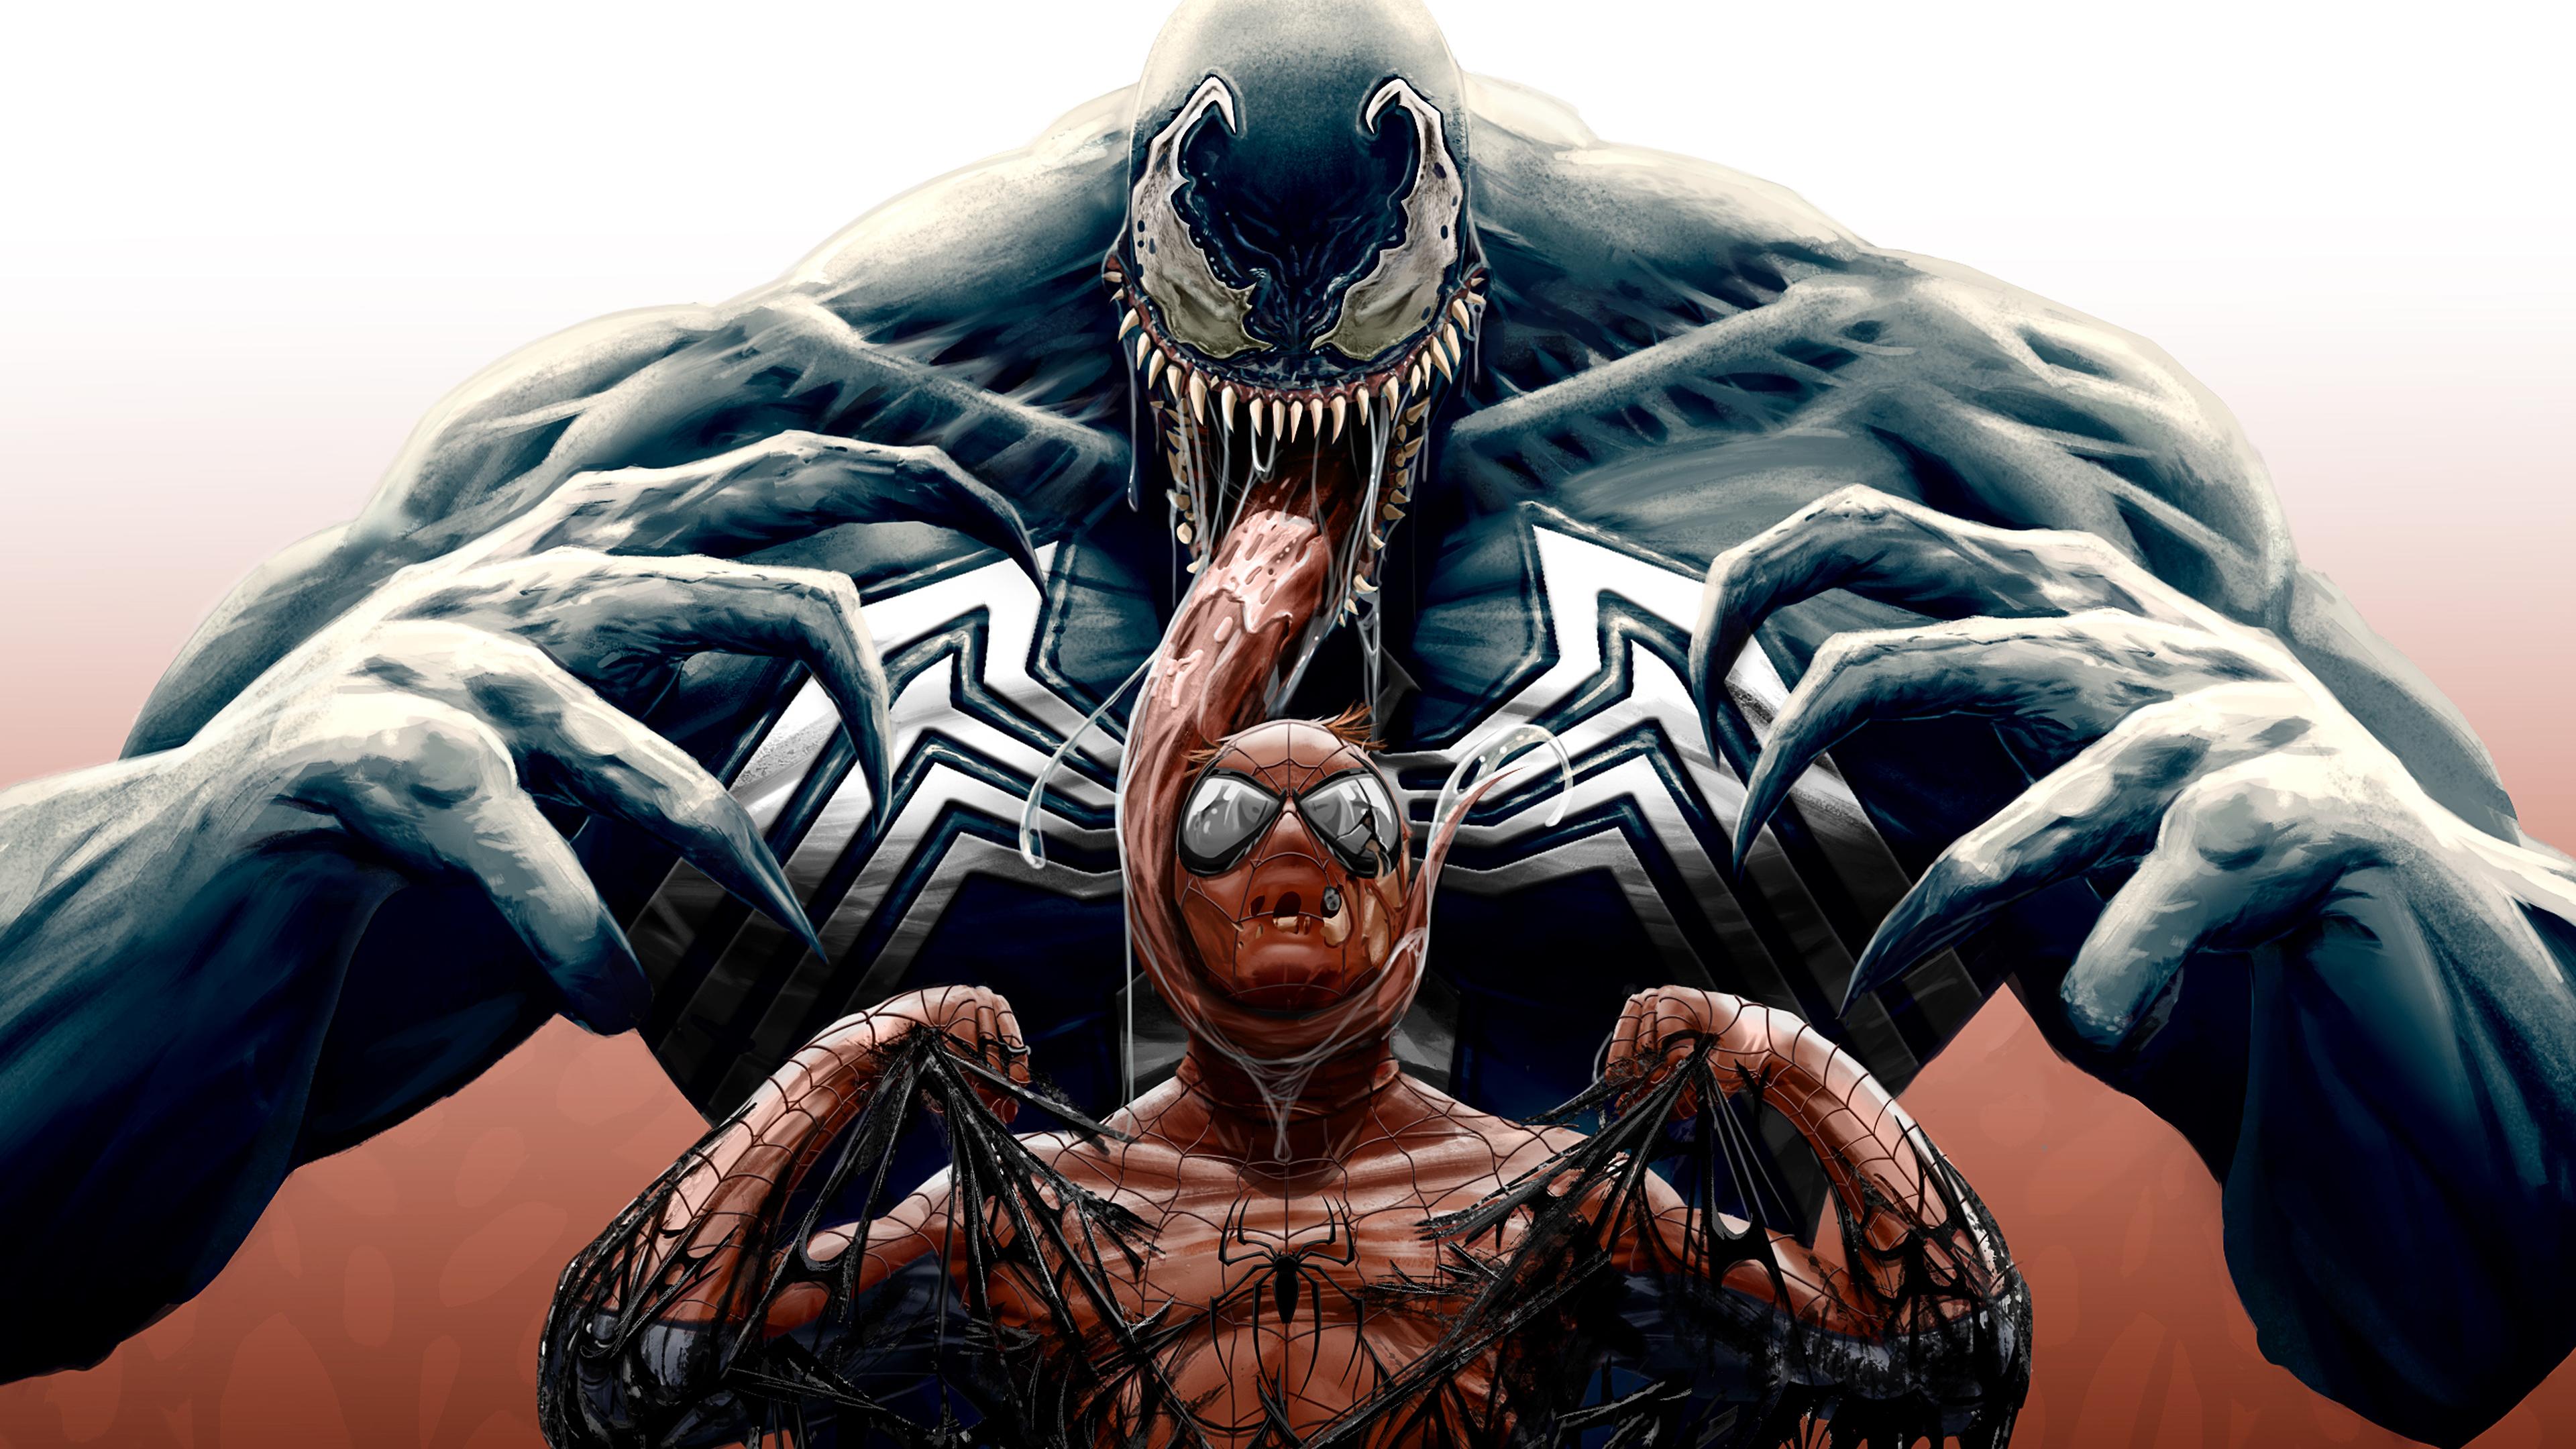 venom spiderman cool artwork 4k 1536523558 - Venom Spiderman Cool Artwork 4k - Venom wallpapers, superheroes wallpapers, spiderman wallpapers, hd-wallpapers, digital art wallpapers, artwork wallpapers, artist wallpapers, 4k-wallpapers